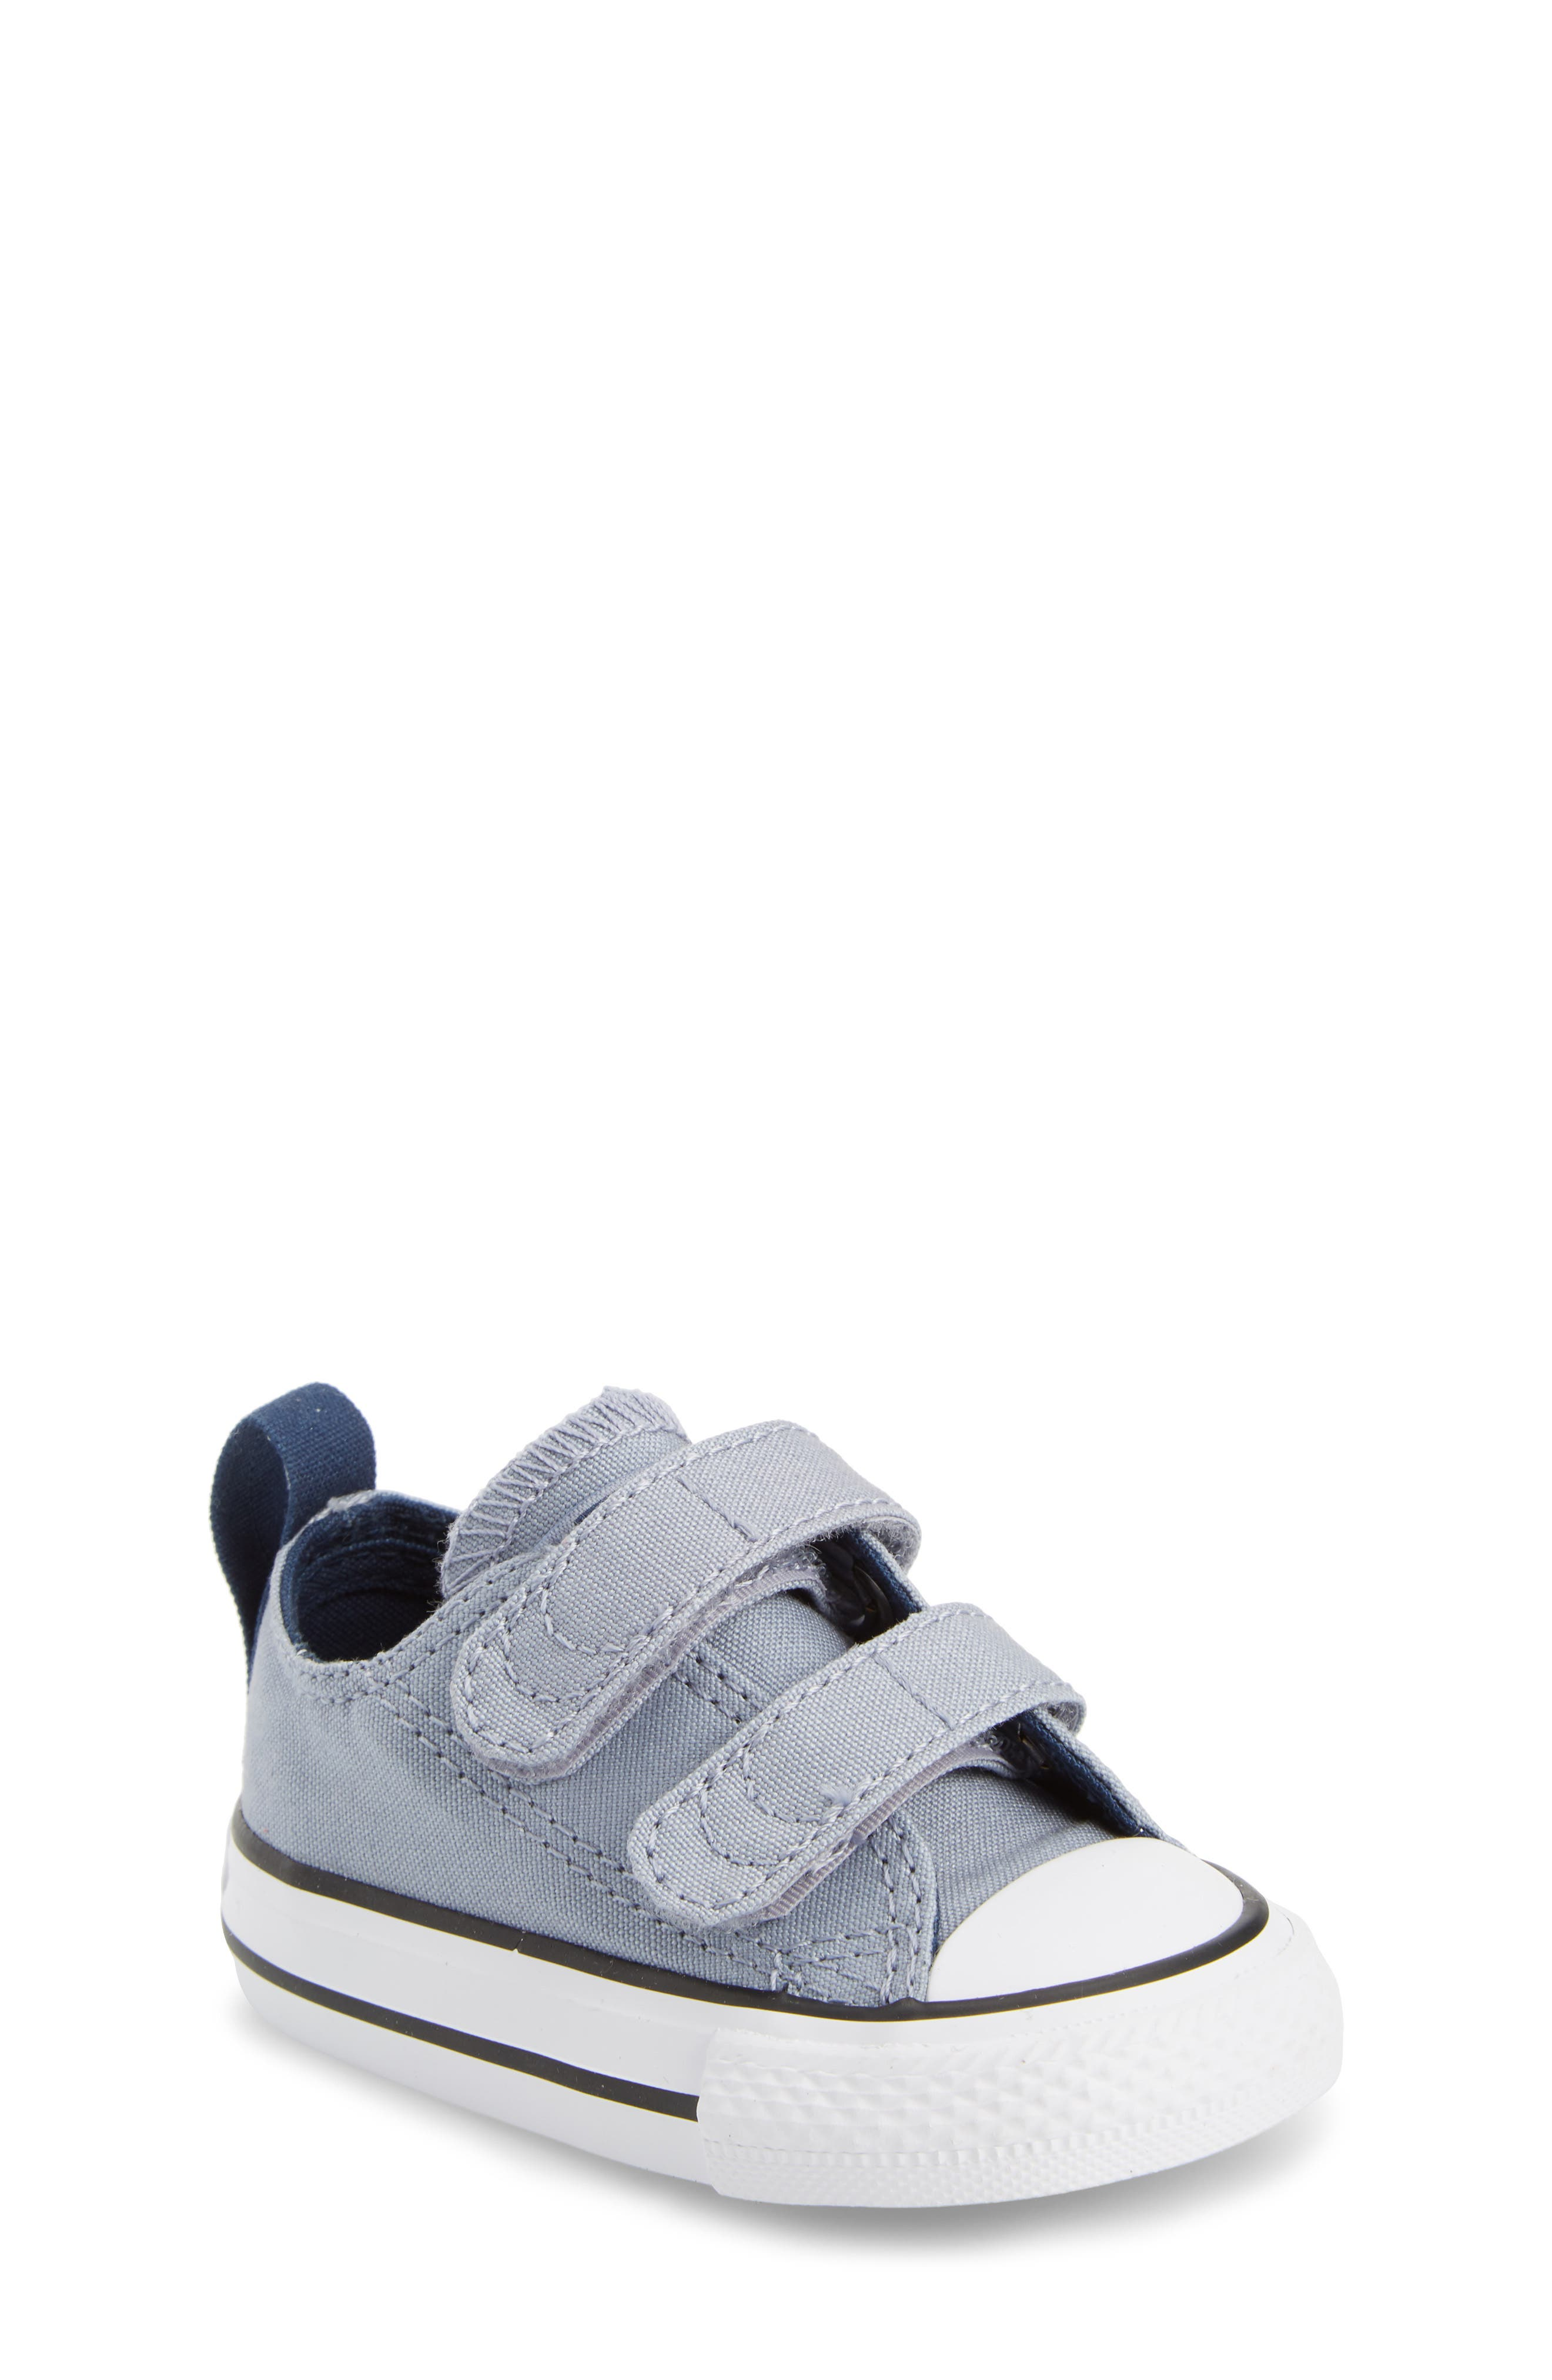 Chuck Taylor<sup>®</sup> All Star<sup>®</sup> Sneaker,                             Main thumbnail 1, color,                             Glacier Grey